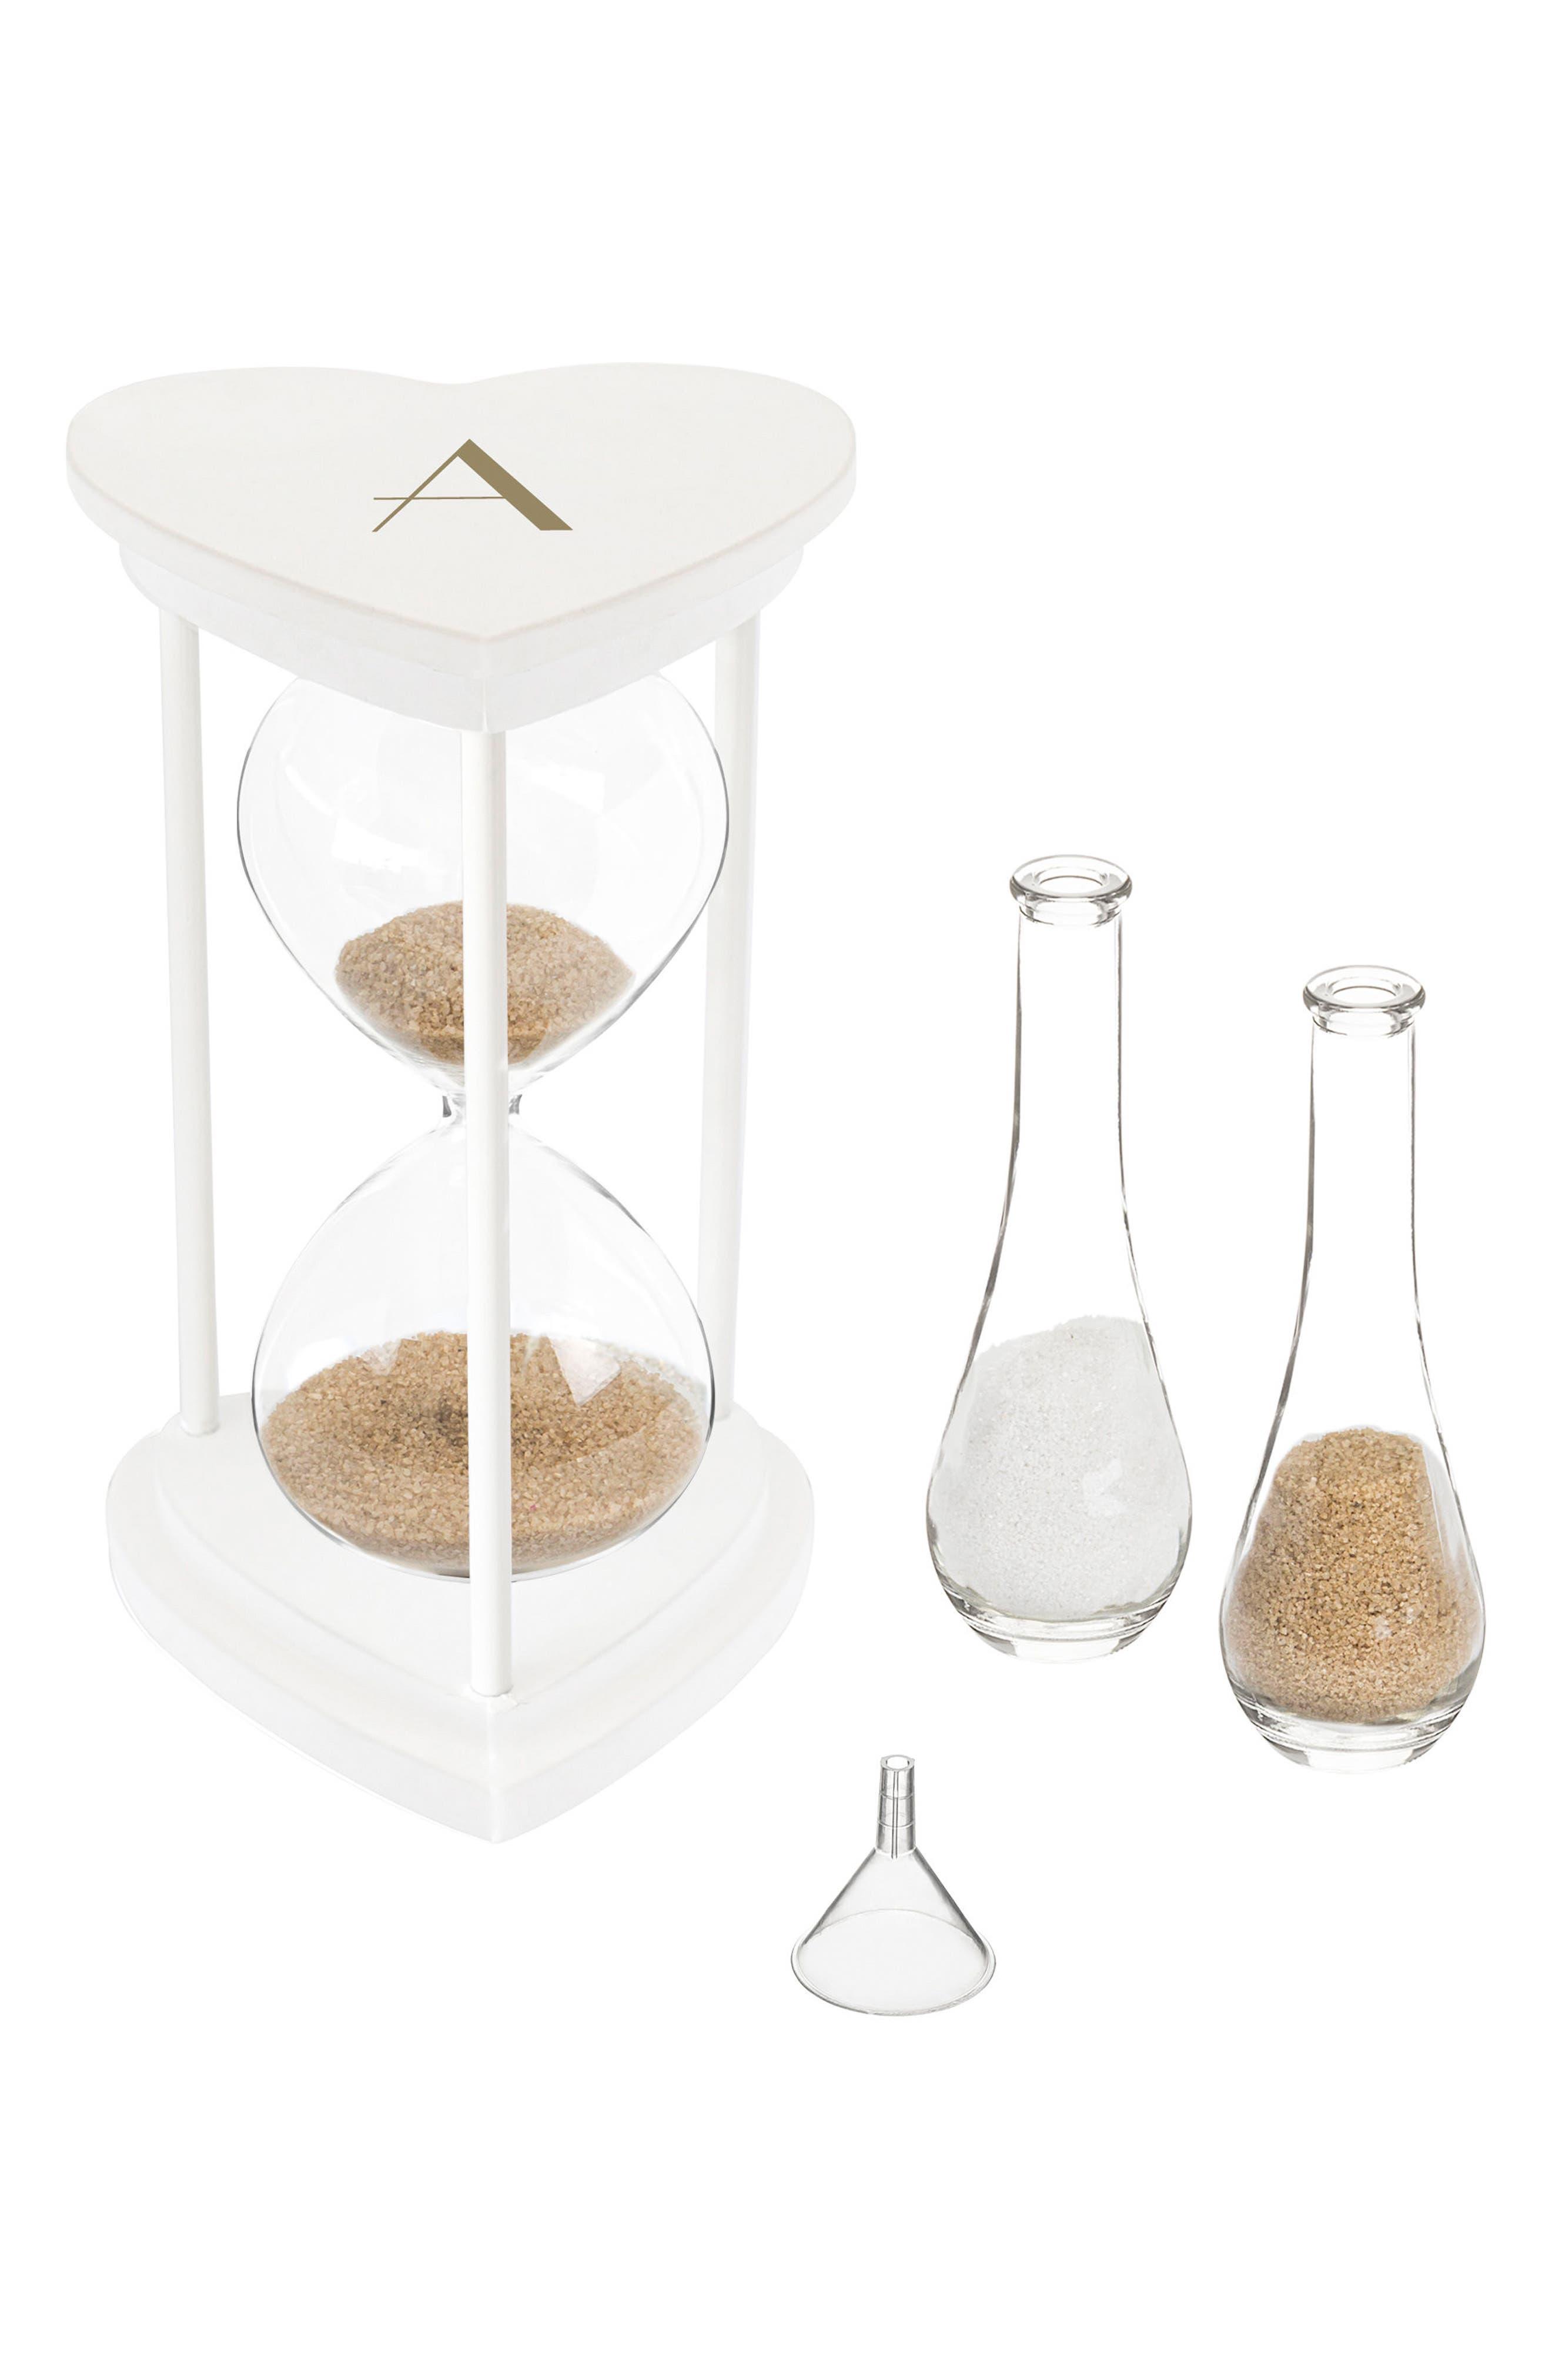 Monogram Unity Sand Ceremony Hourglass Set,                         Main,                         color,